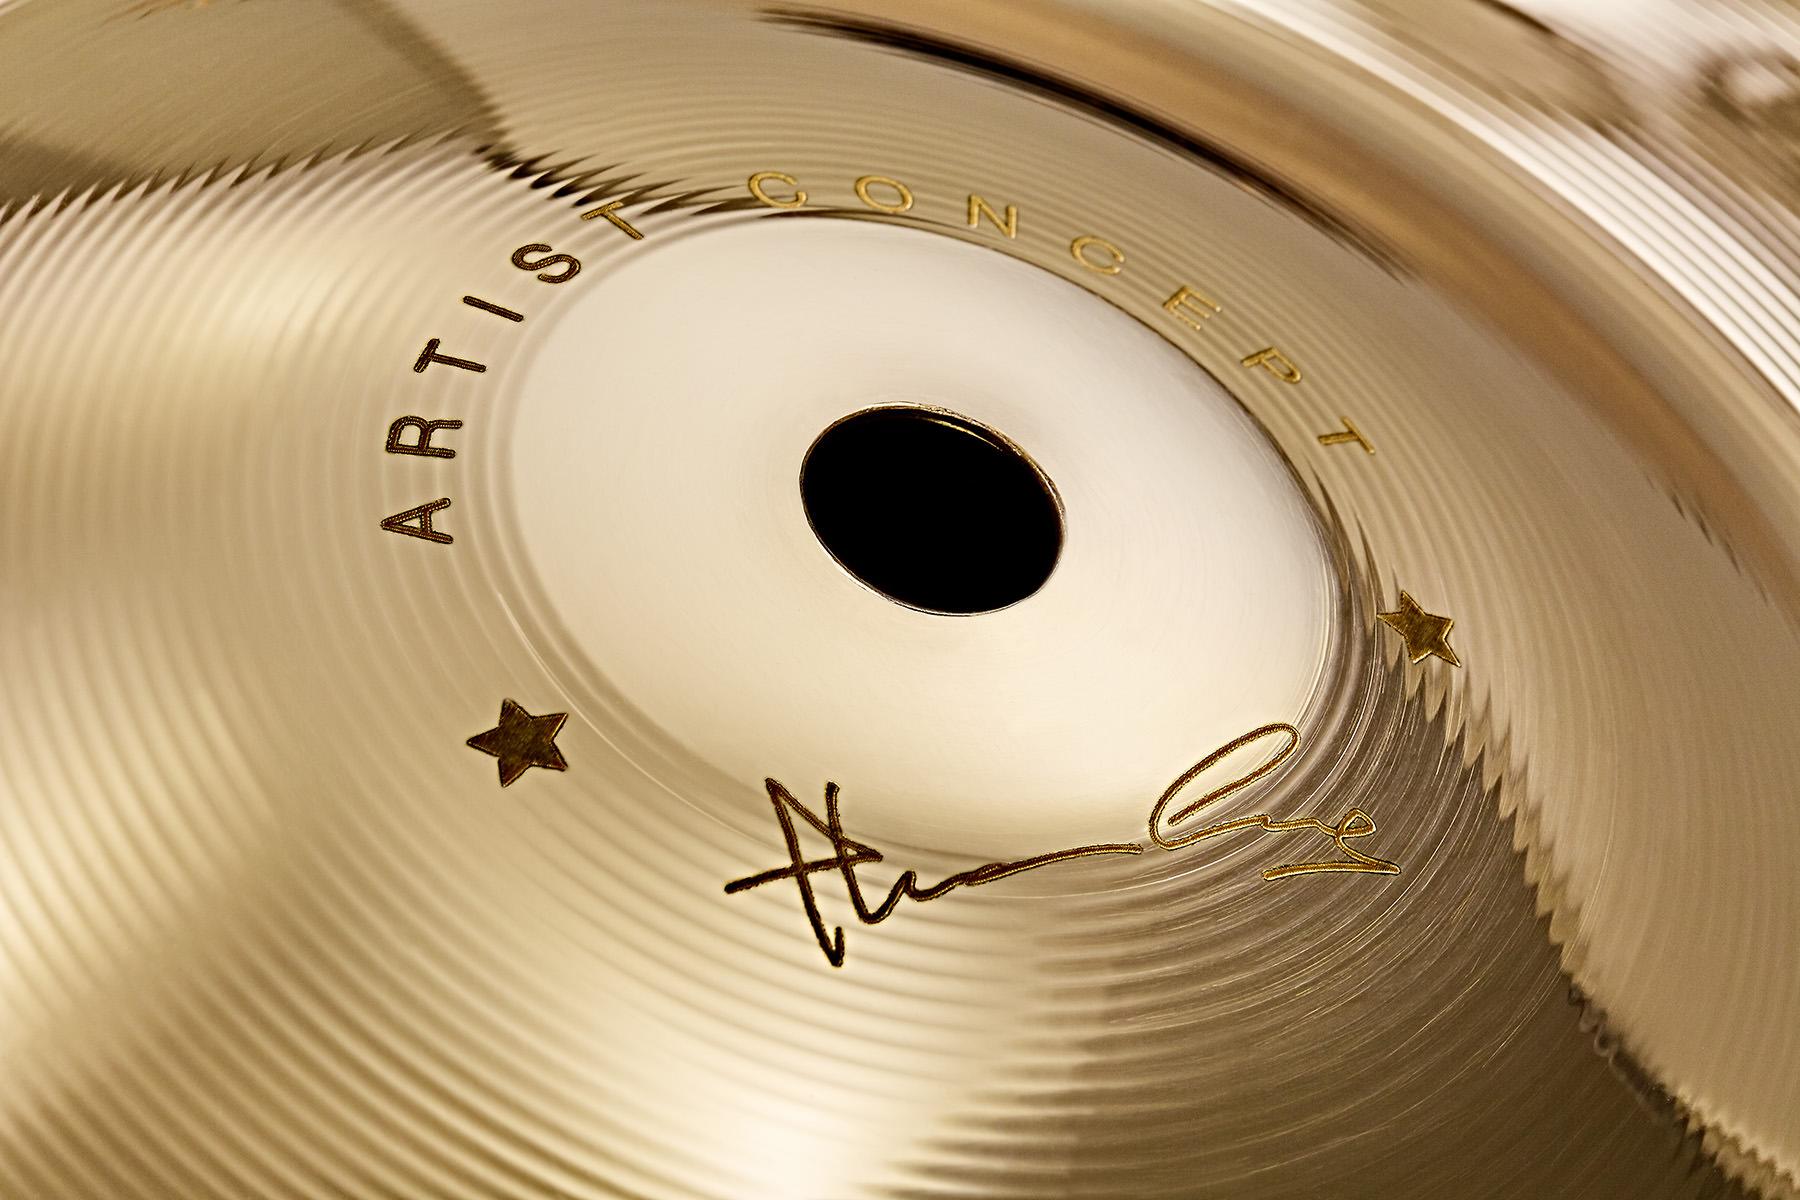 Cymbals Artist concept